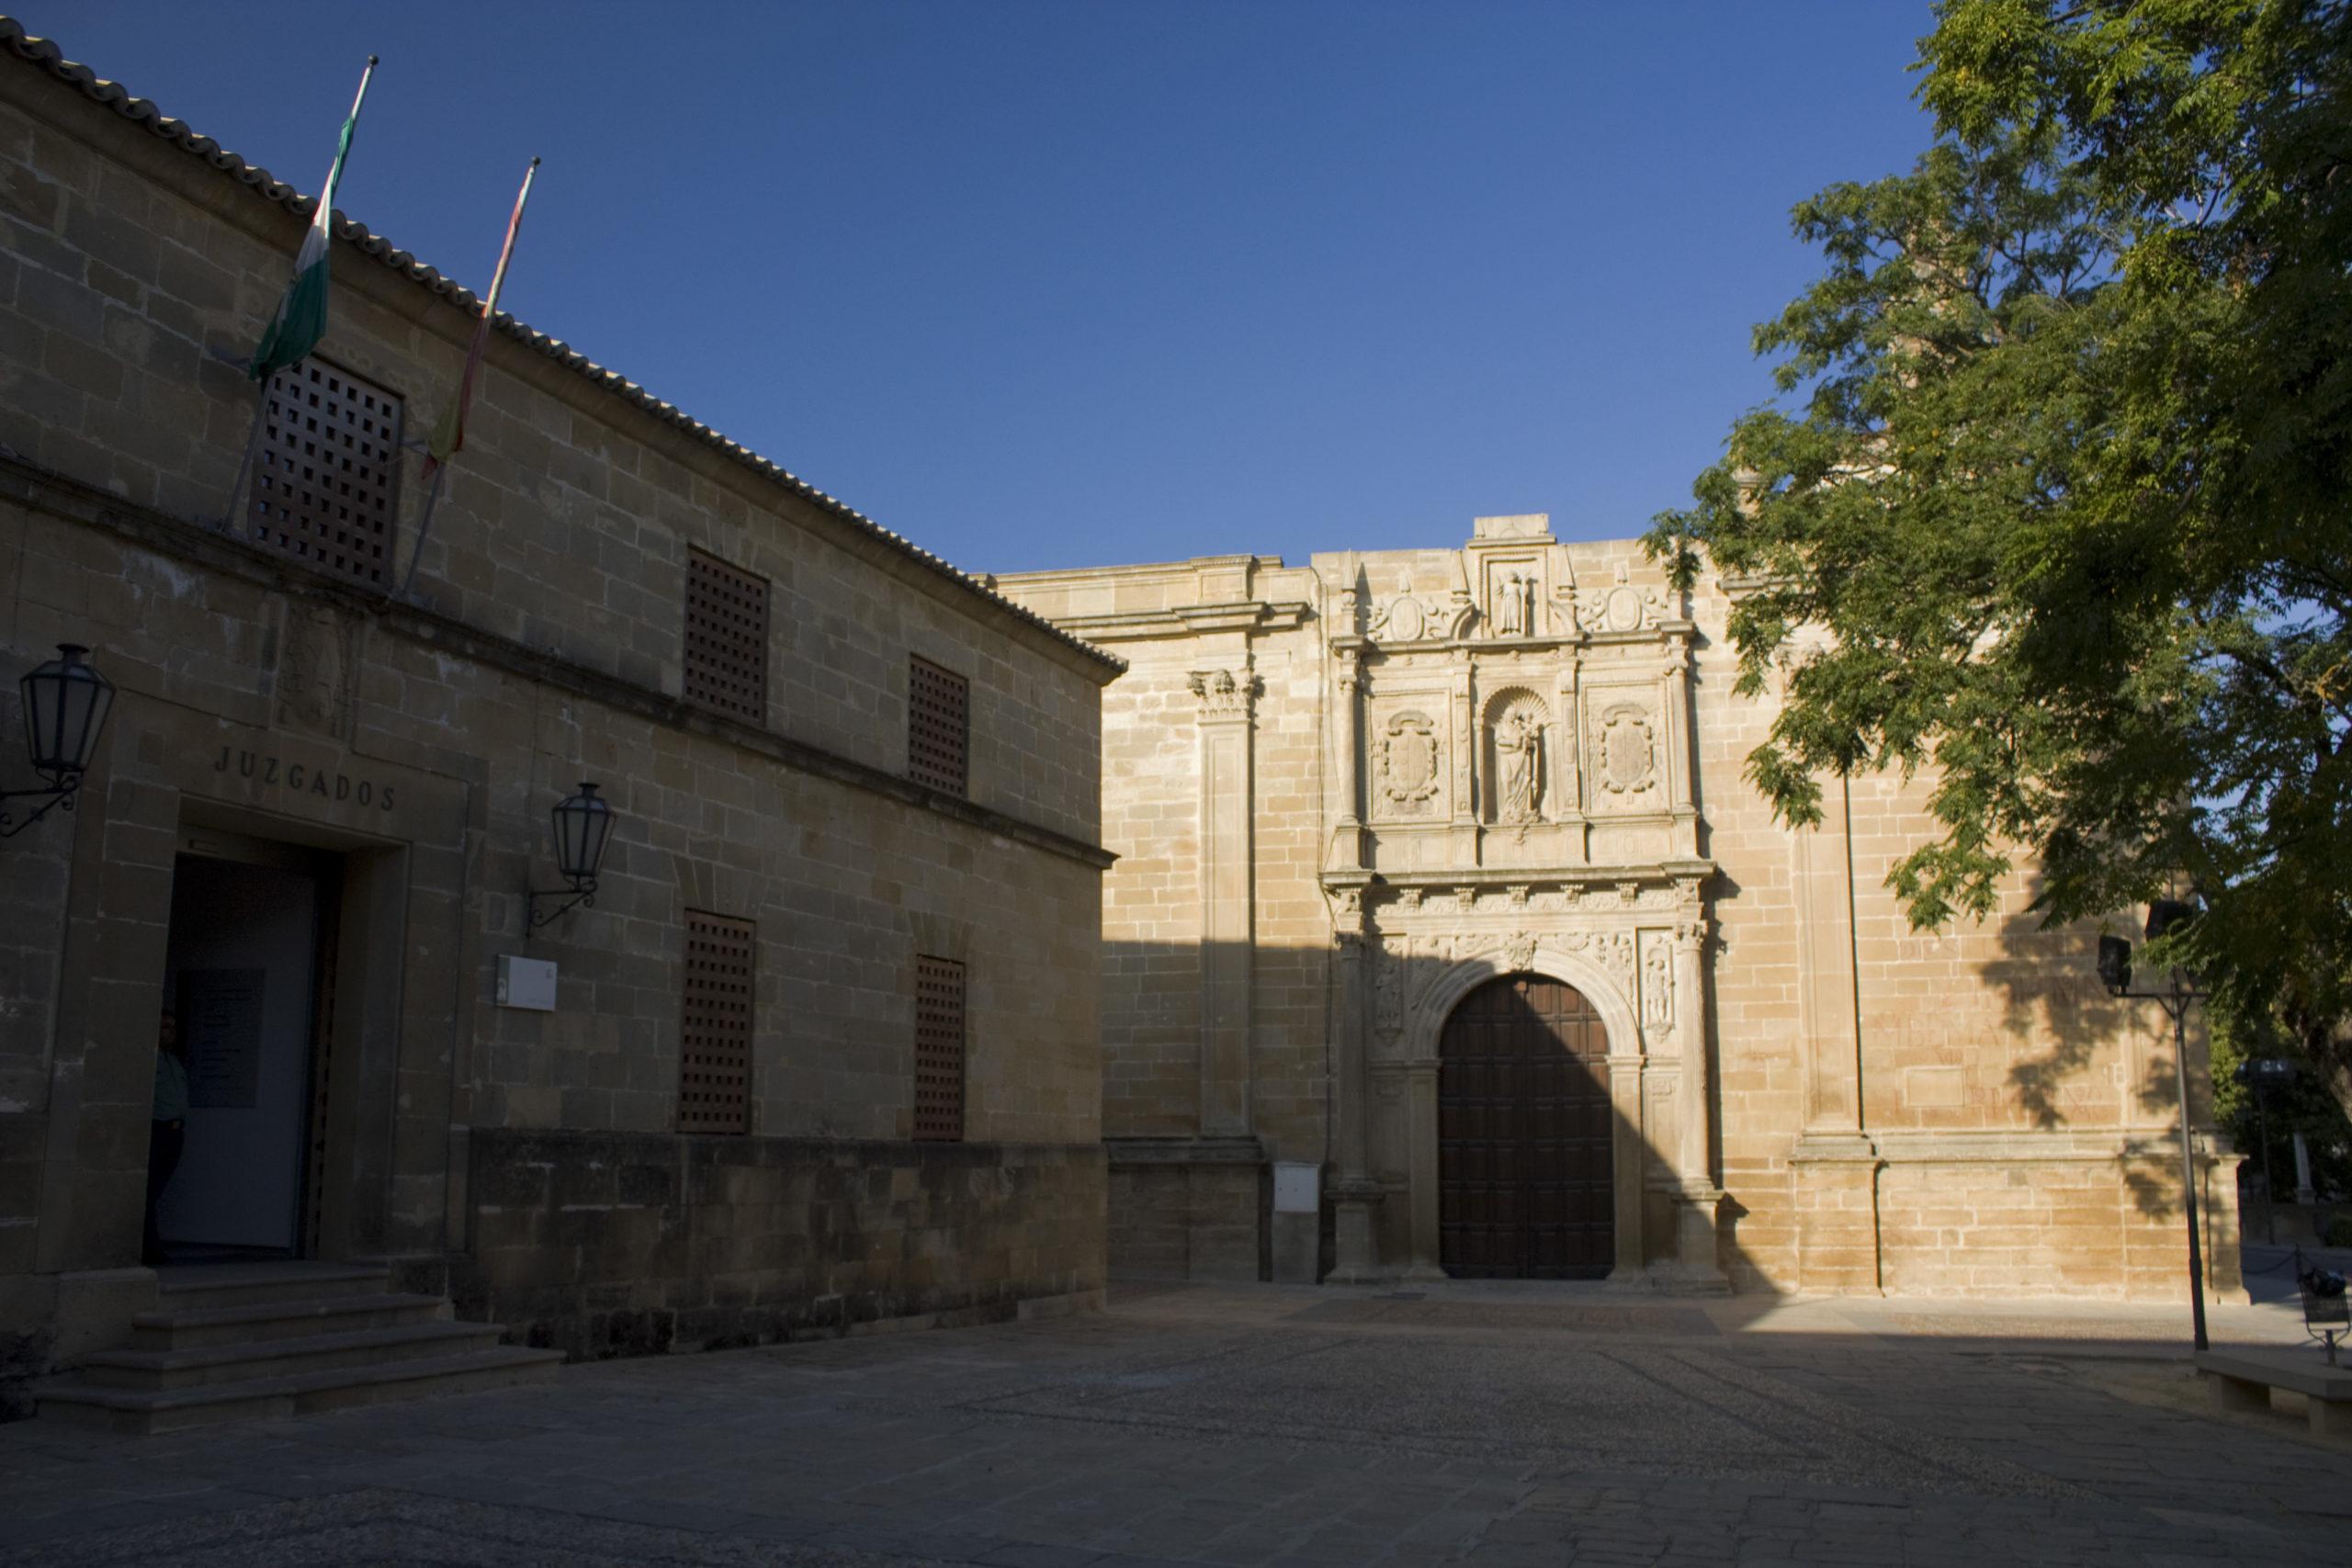 la carcel del obispo scaled - La cárcel del Obispo